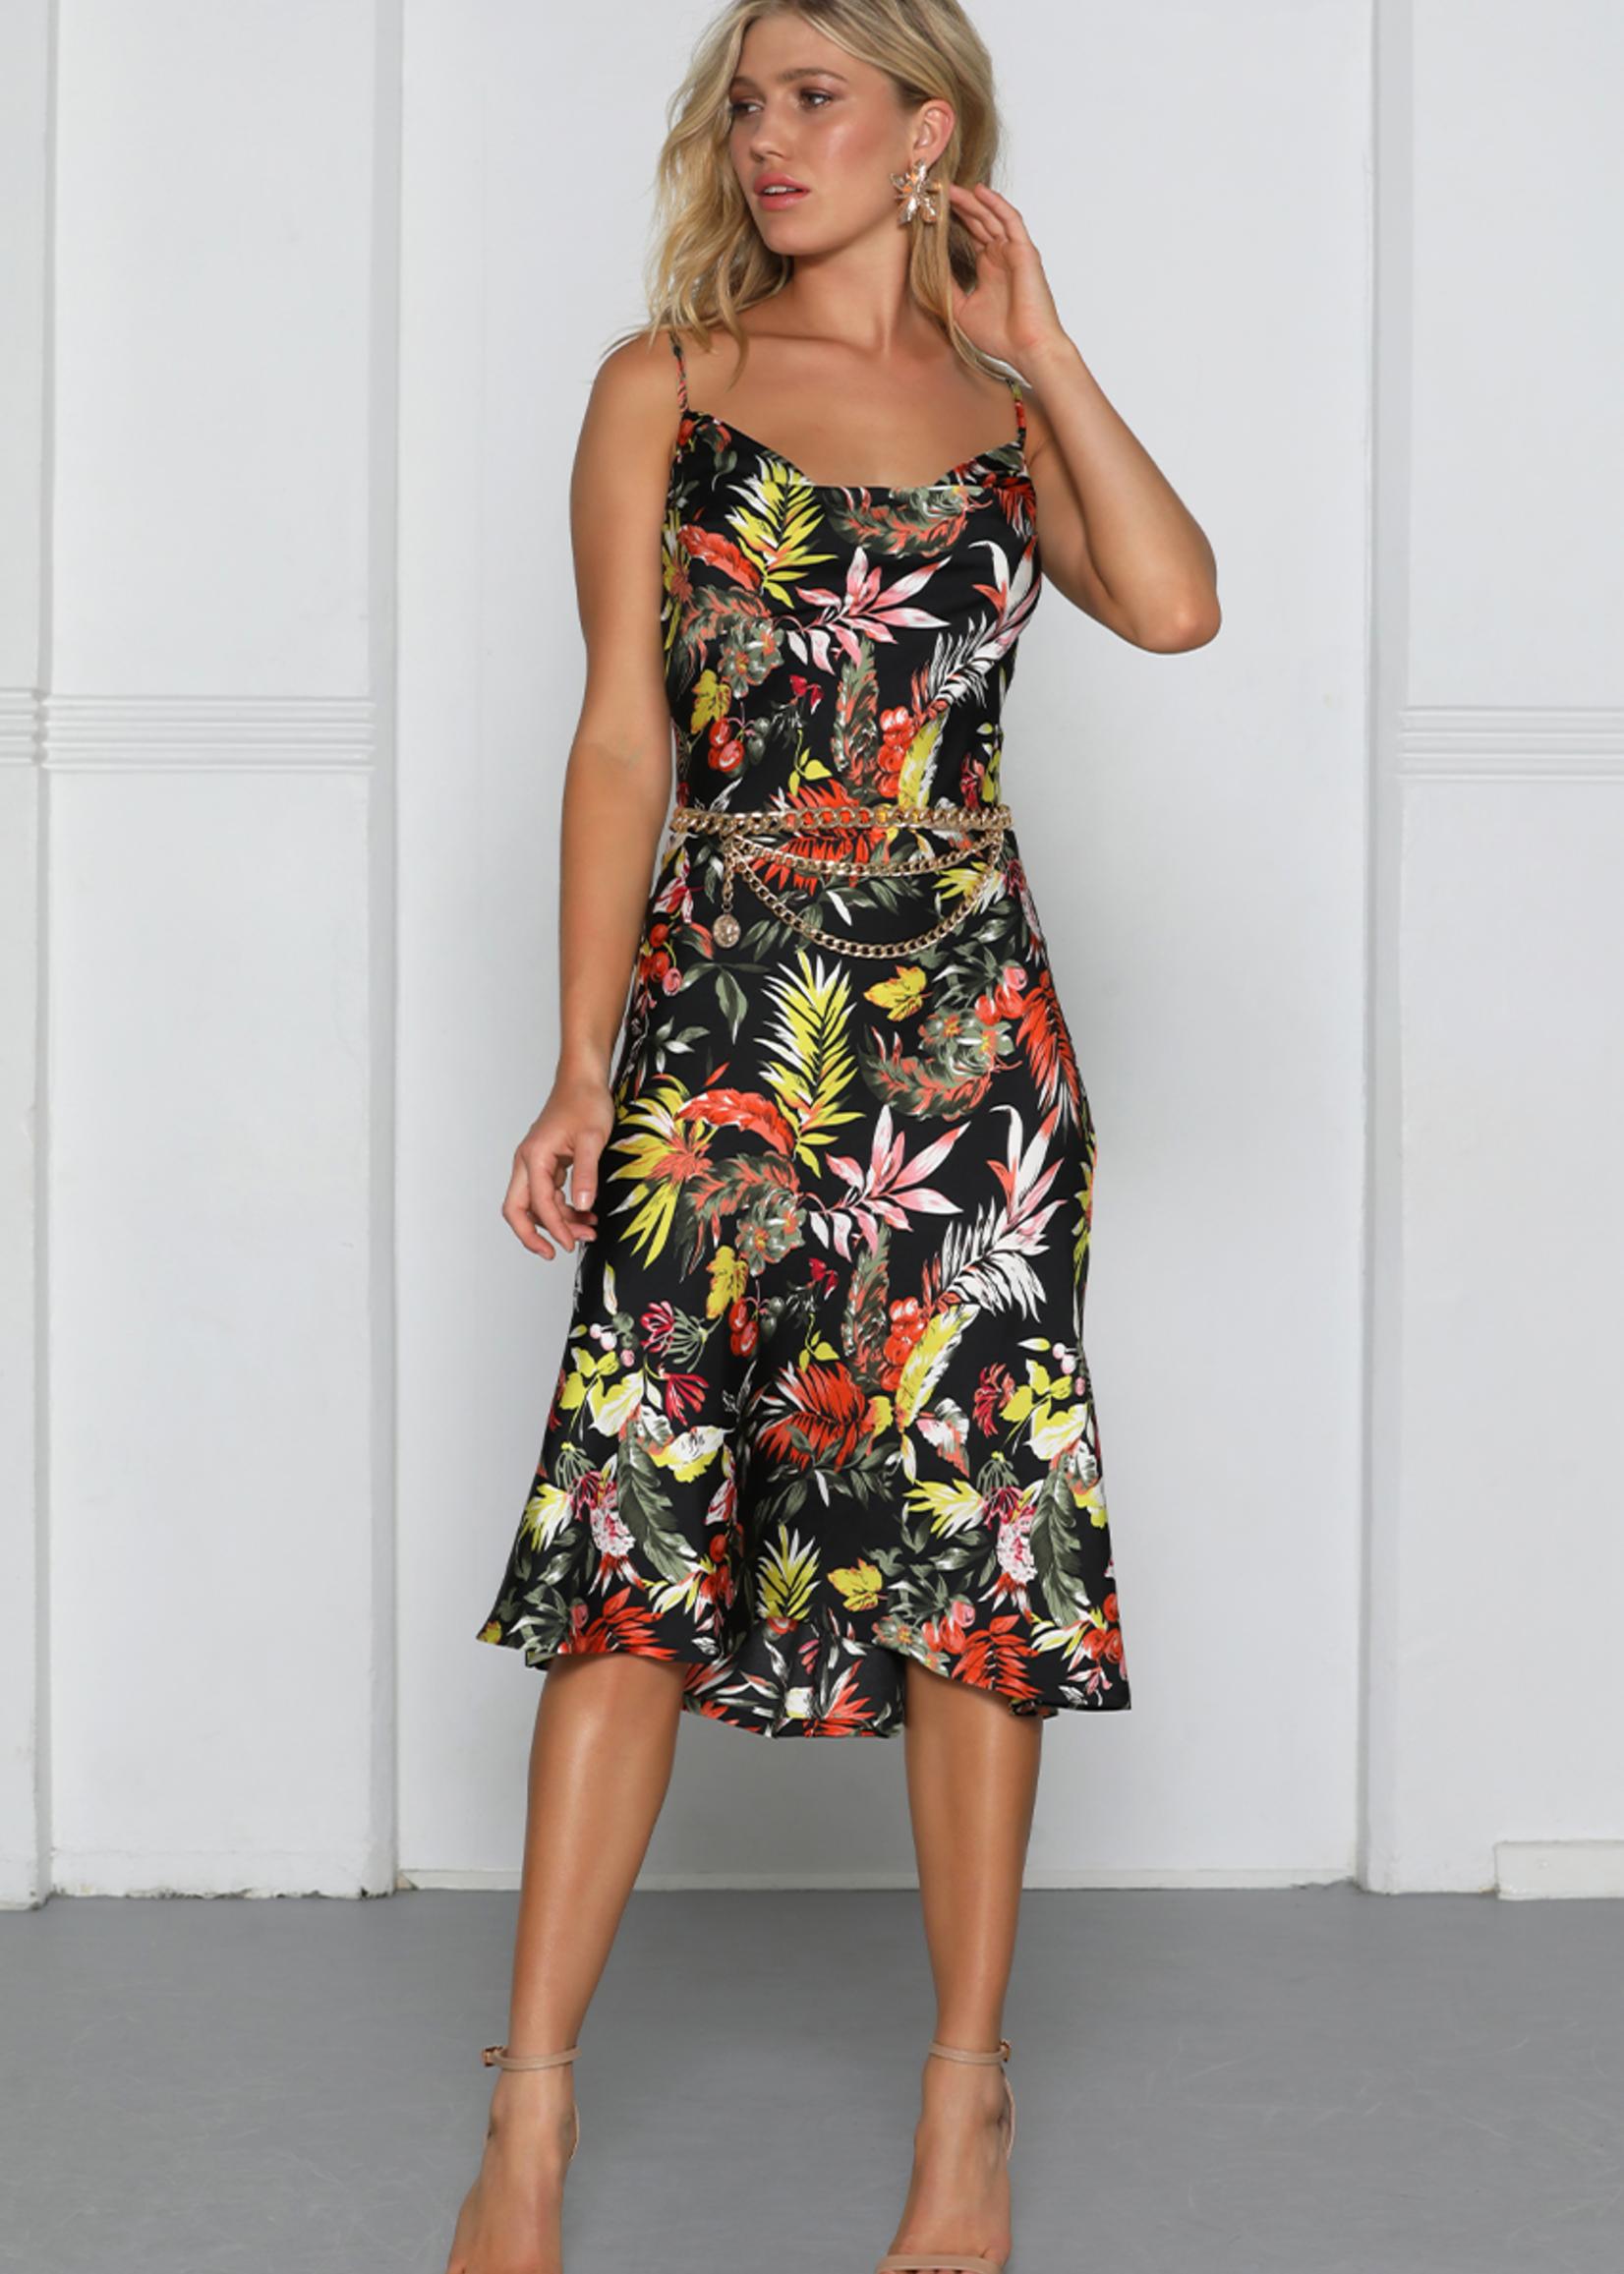 Patchouli Slip Dress